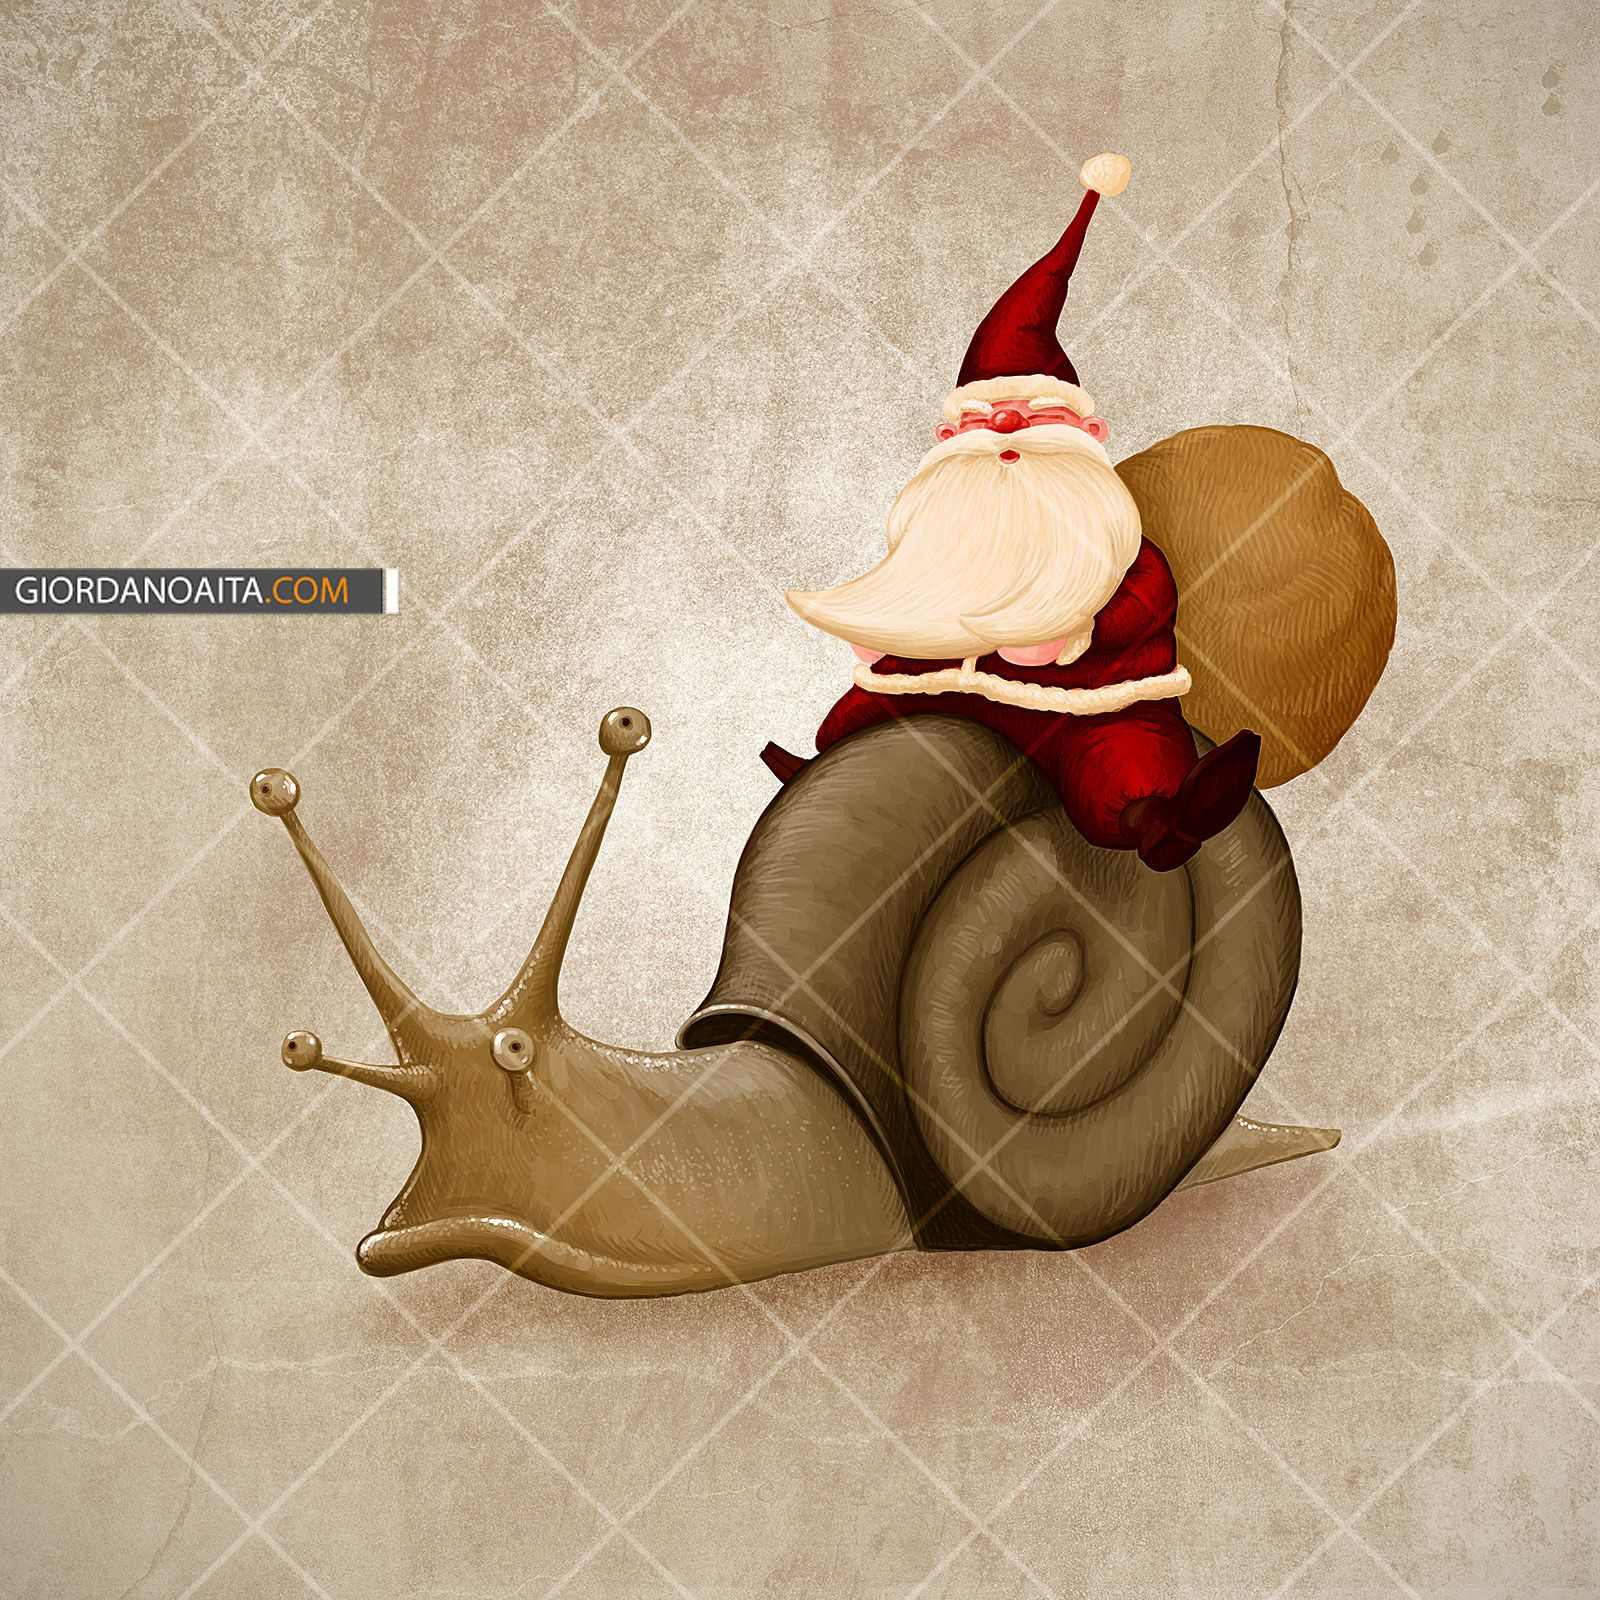 Santa slow! - © Giordano Aita - All right reserved     http://it.fotolia.com/p/120313/partner/120313